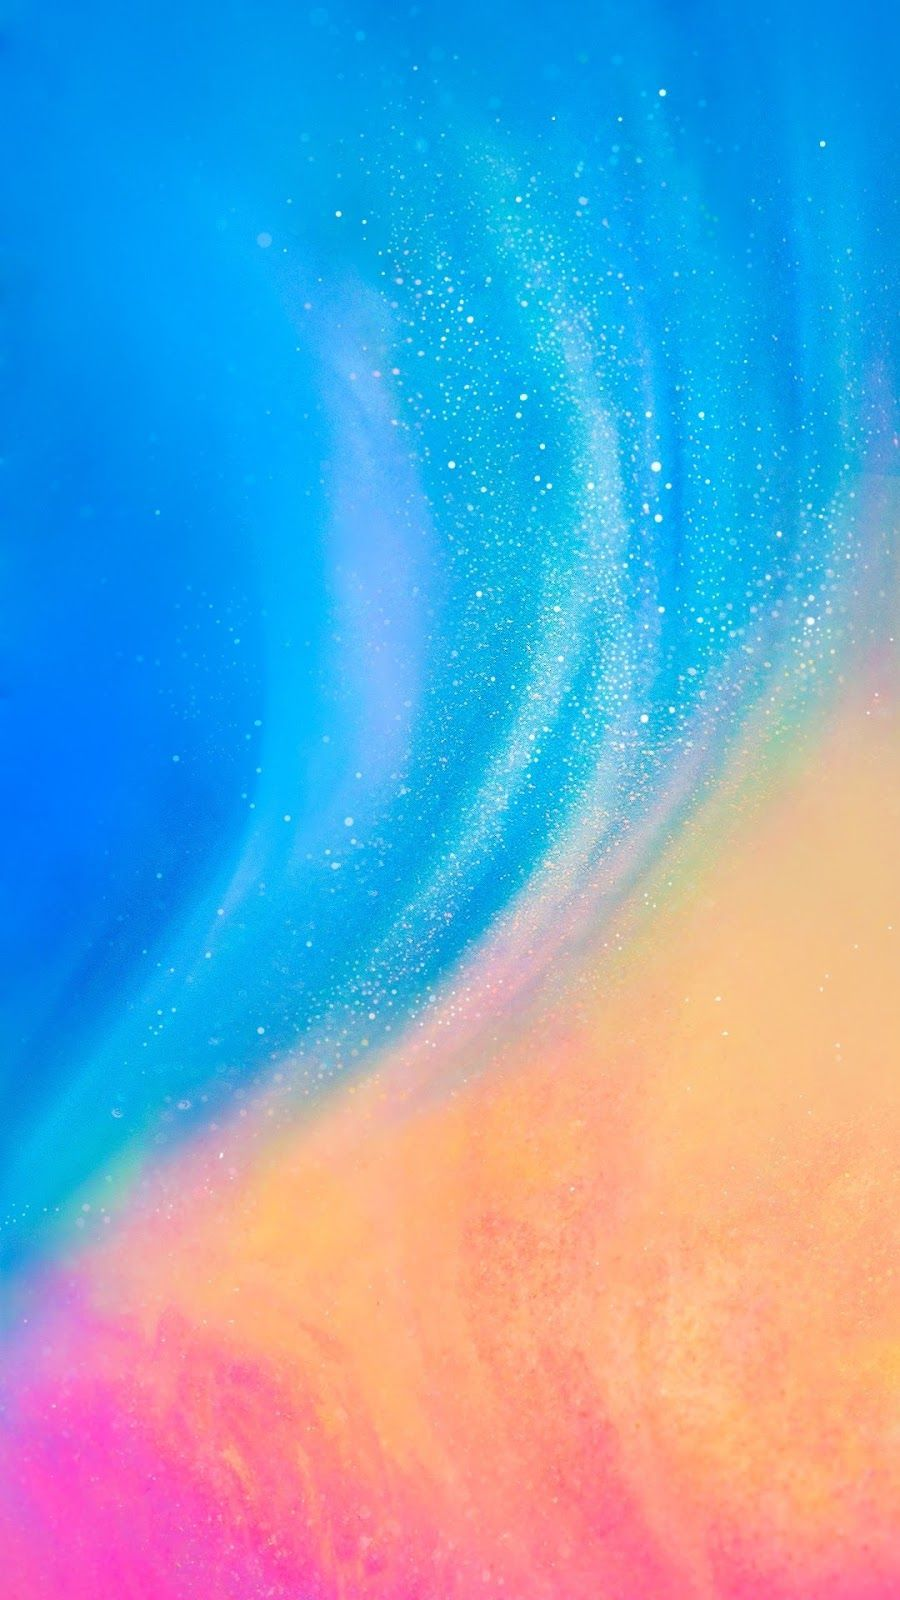 Samsung Wallpaper A10 Hintergrundbild Tapete Samsung Wallpaper Abstract Iphone Wallpaper Galaxy Phone Wallpaper